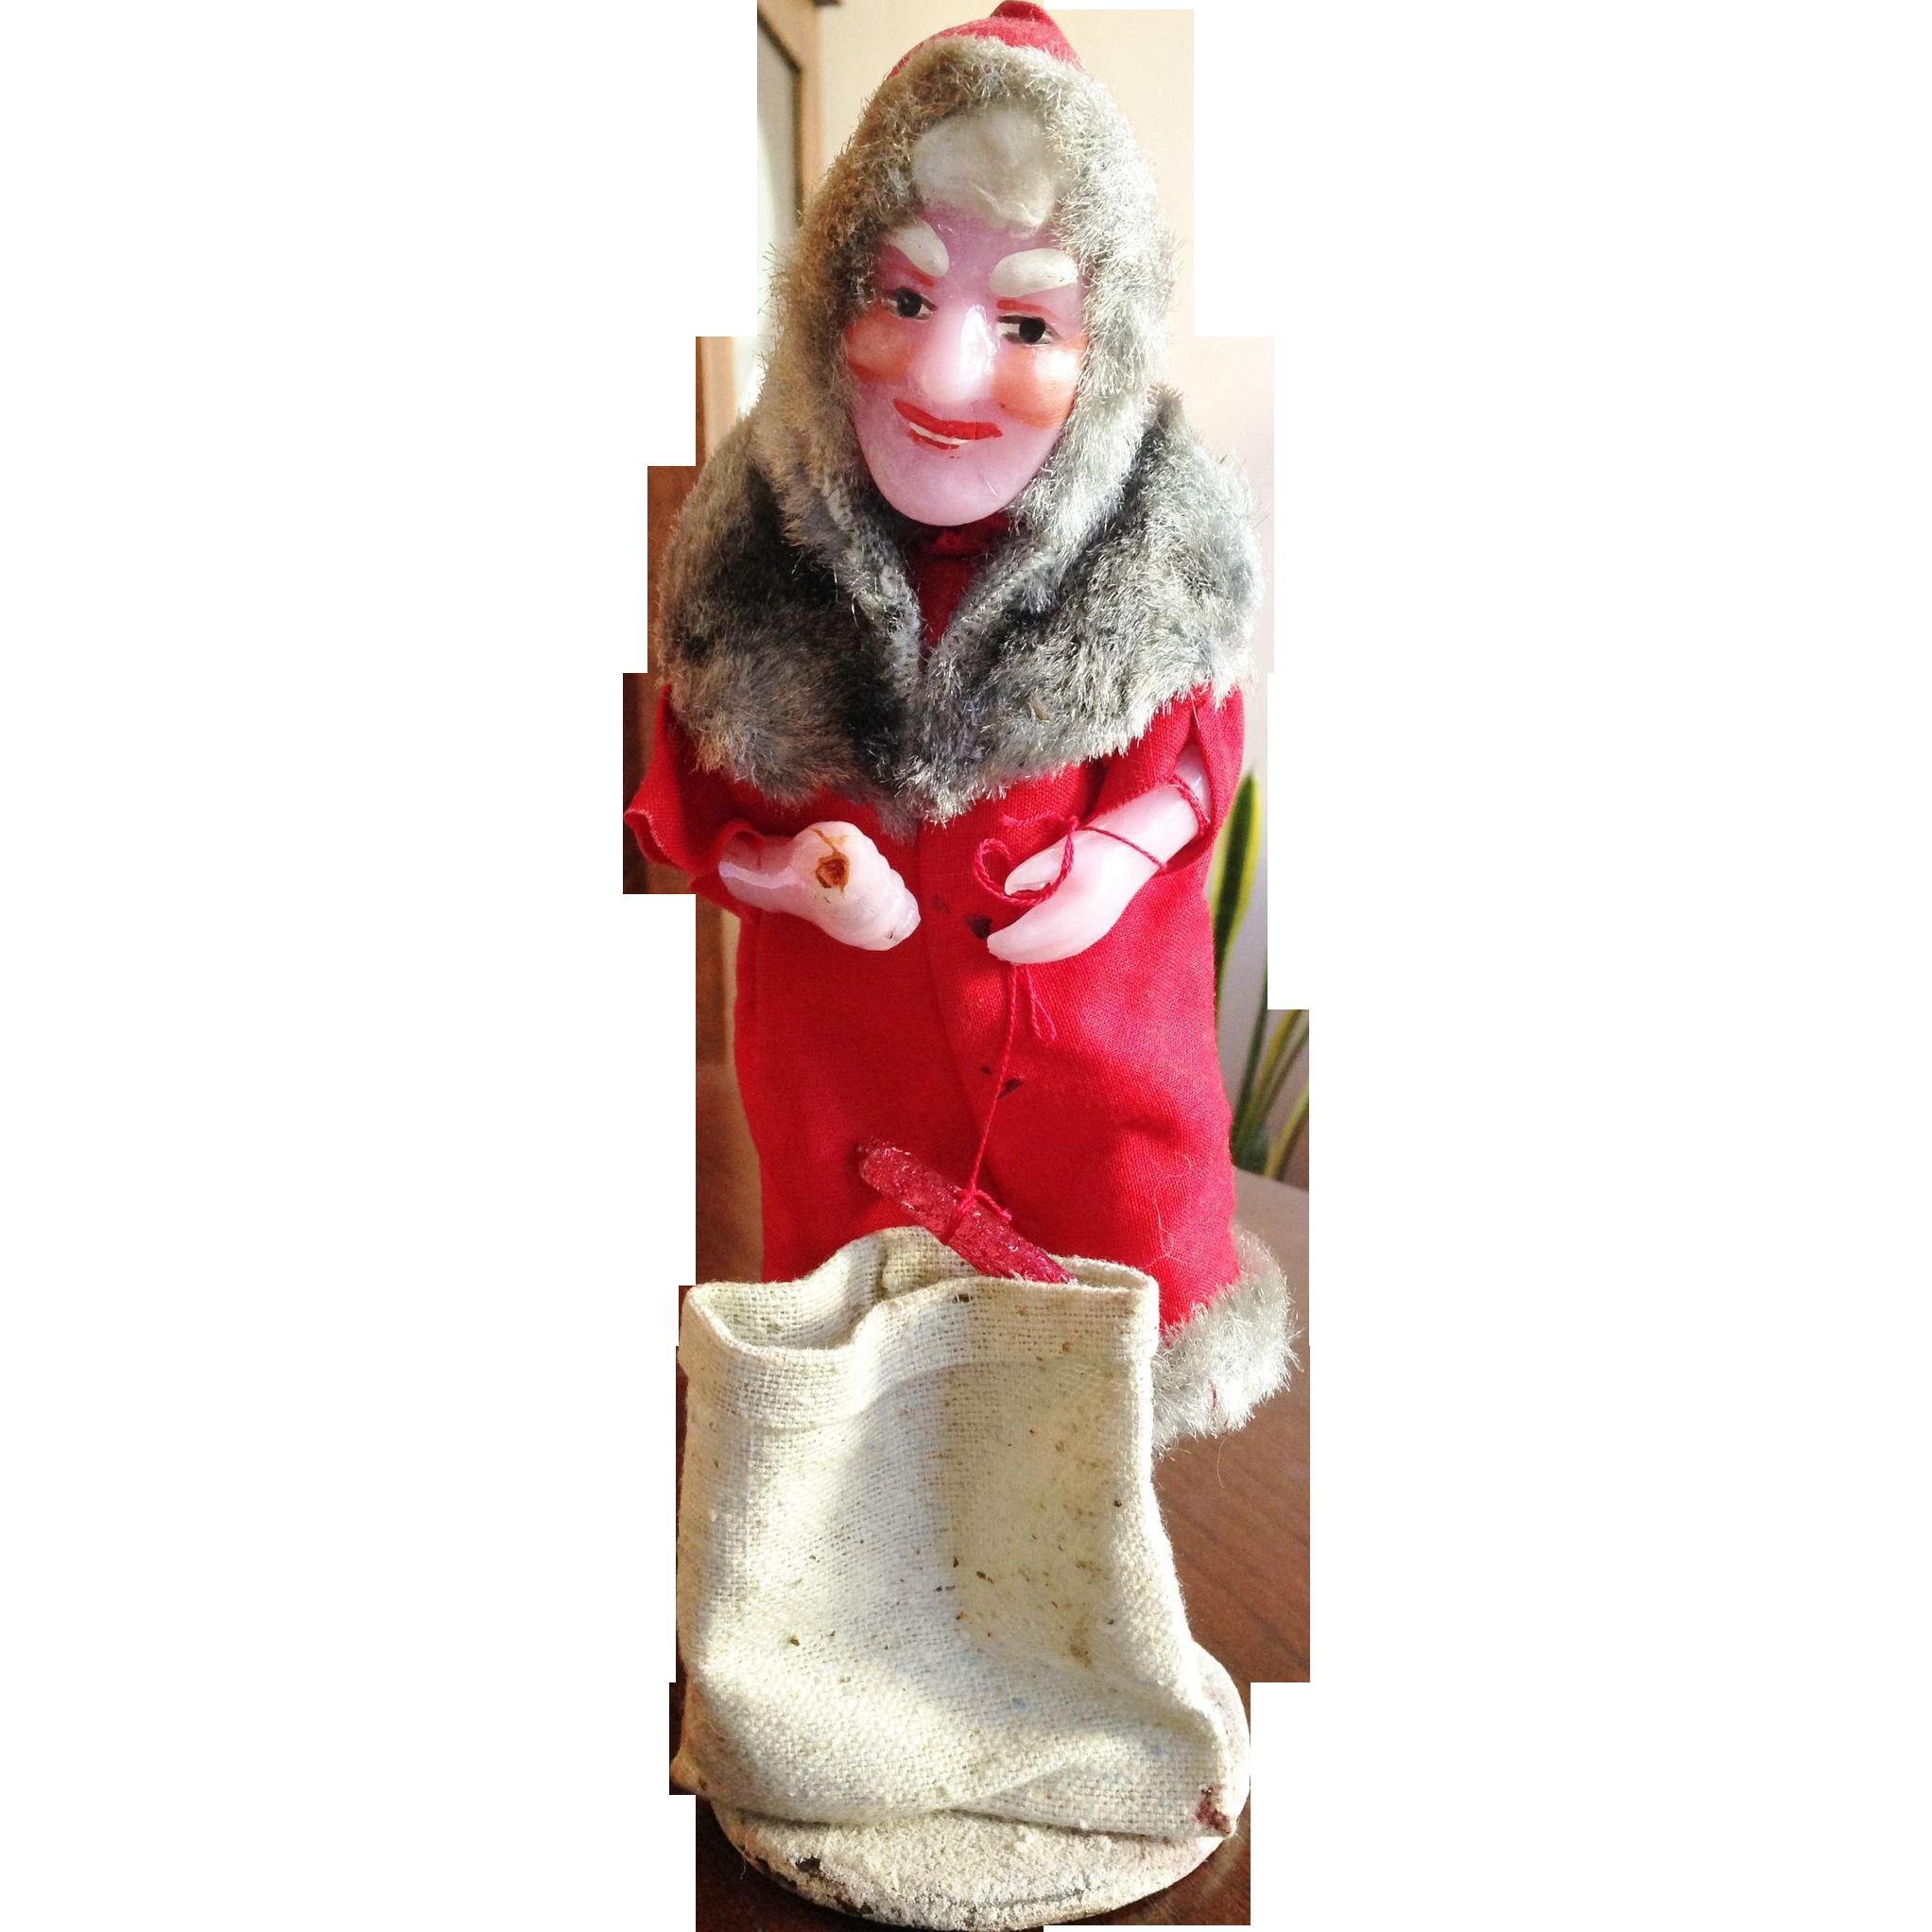 Ded Moroz Russian Santa Claus Figurine